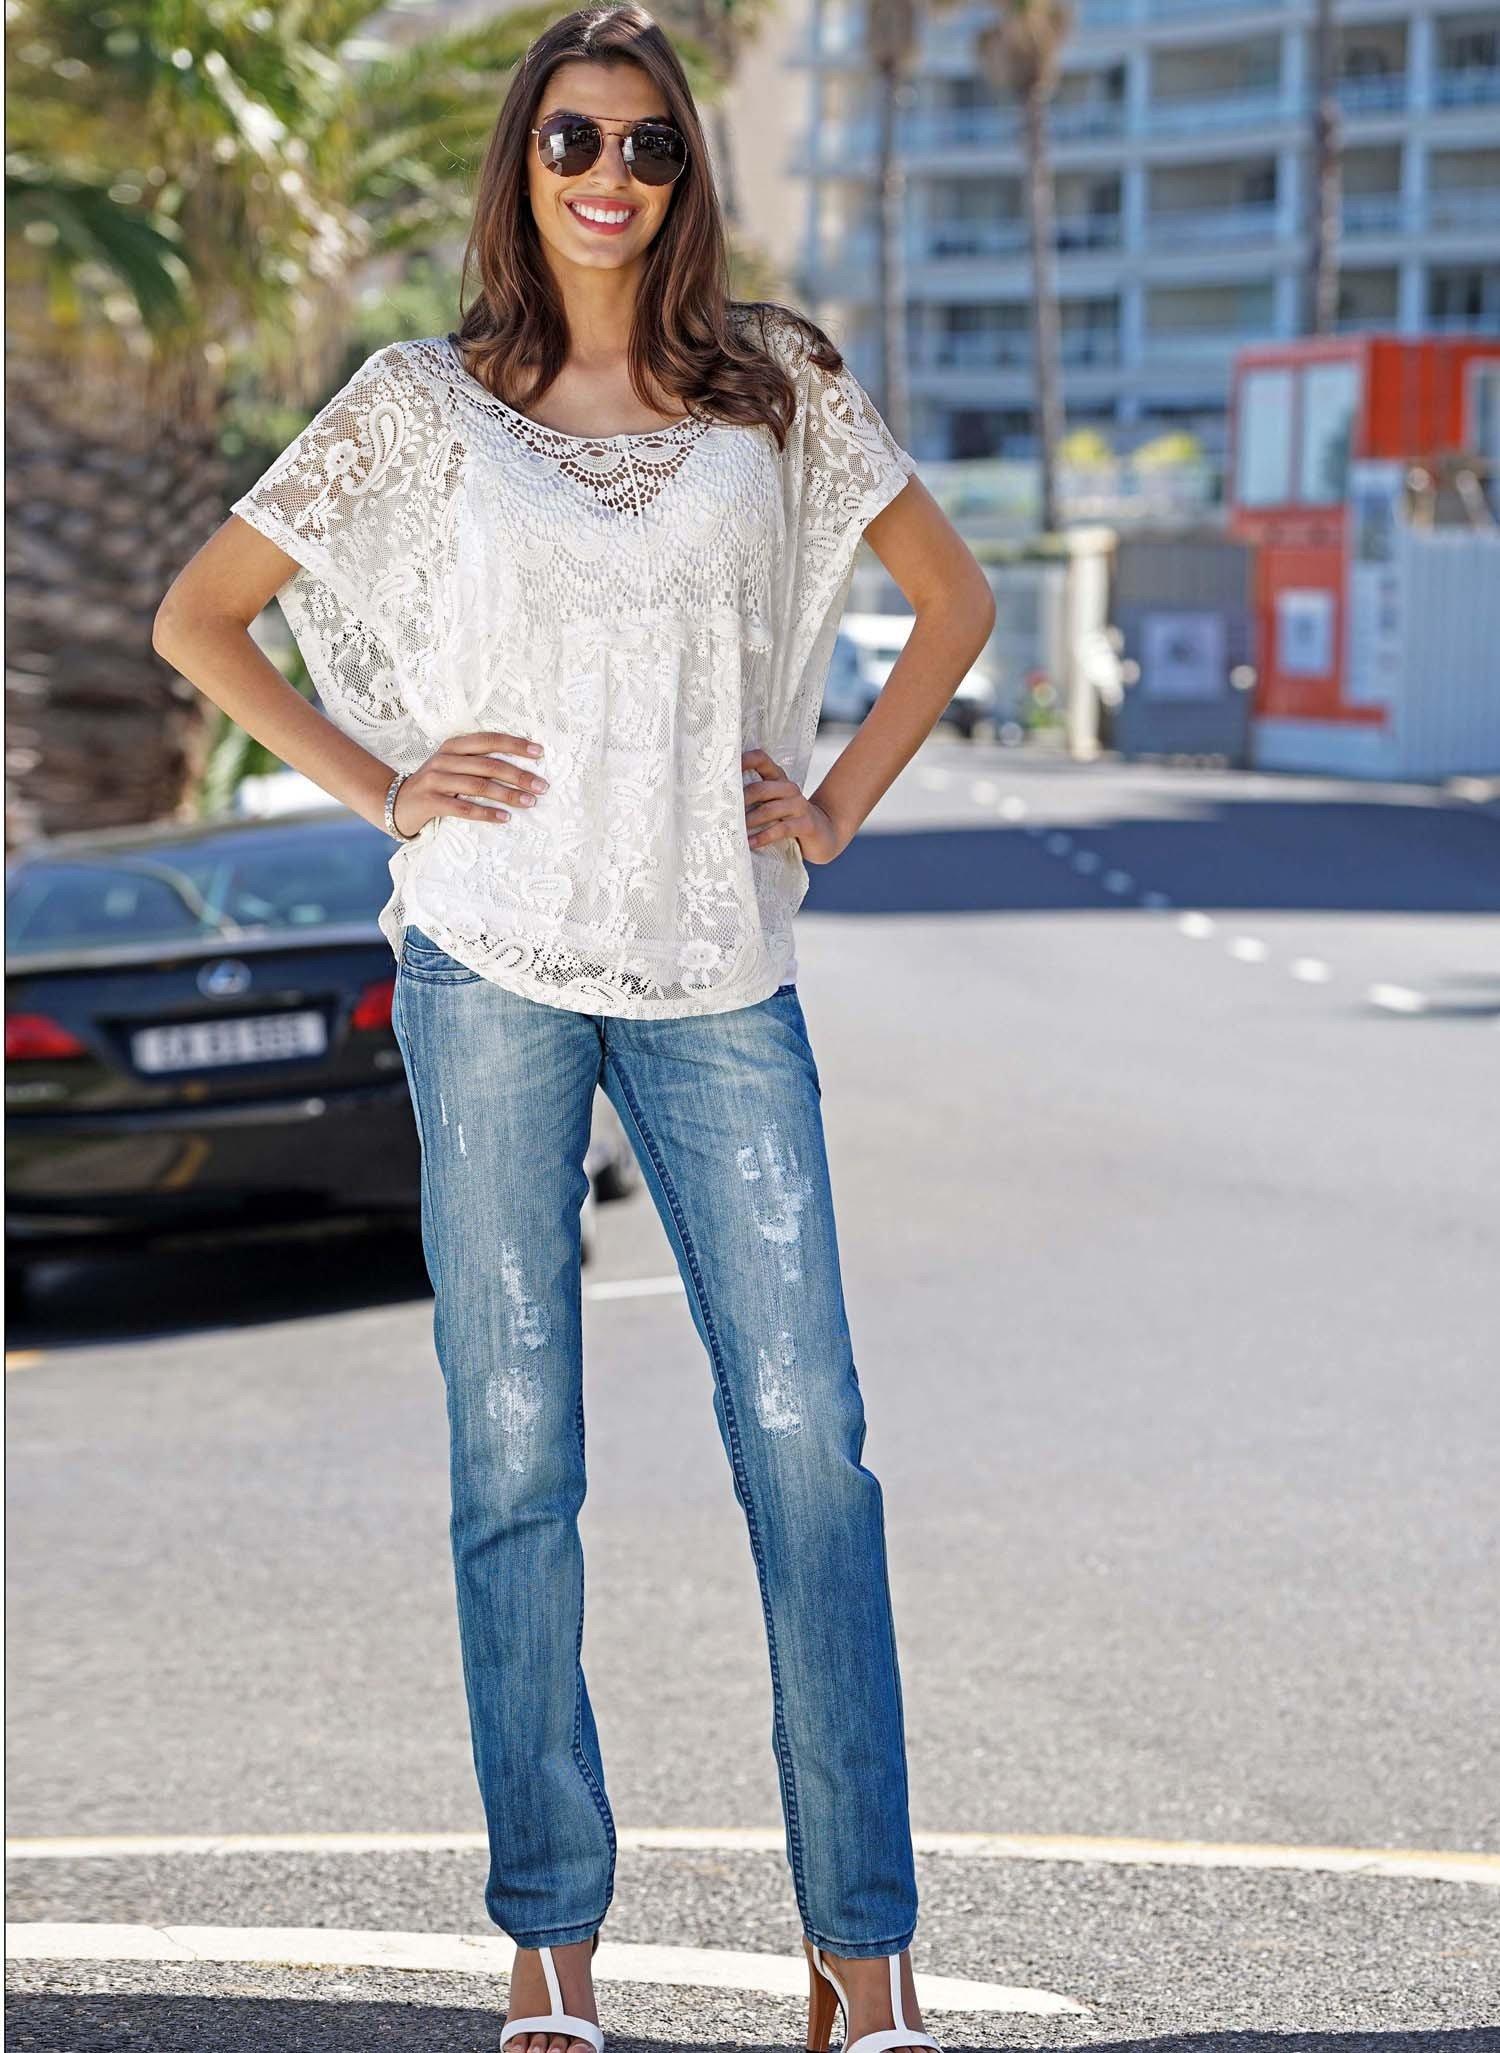 D-Jeans,Röhrli,Loch,Blue-Denim 34 - 1 - Ronja.ch